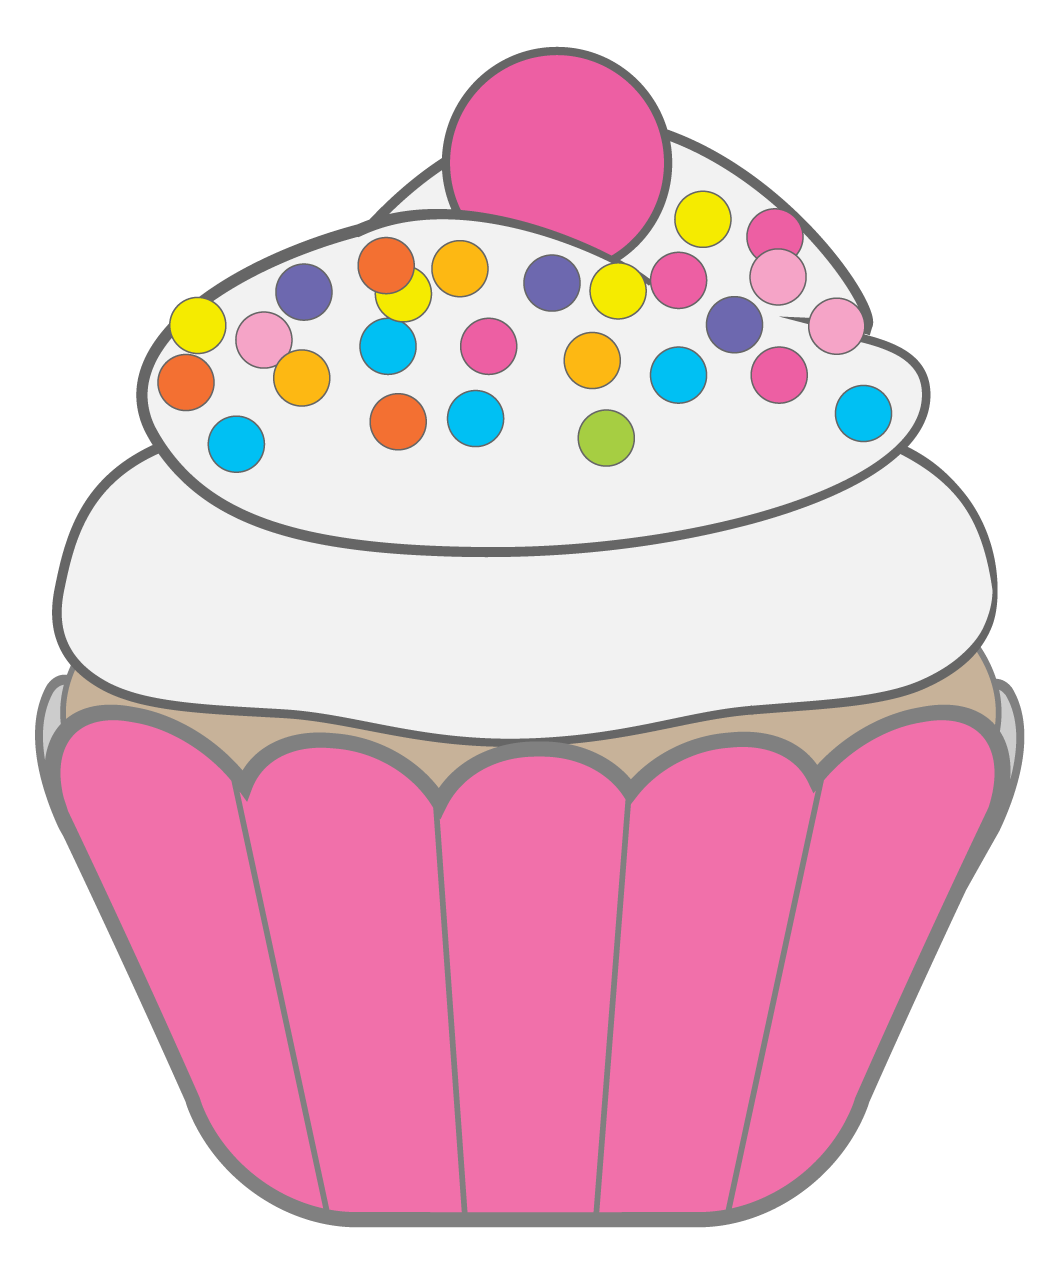 1050x1274 Cake Clip Art Free